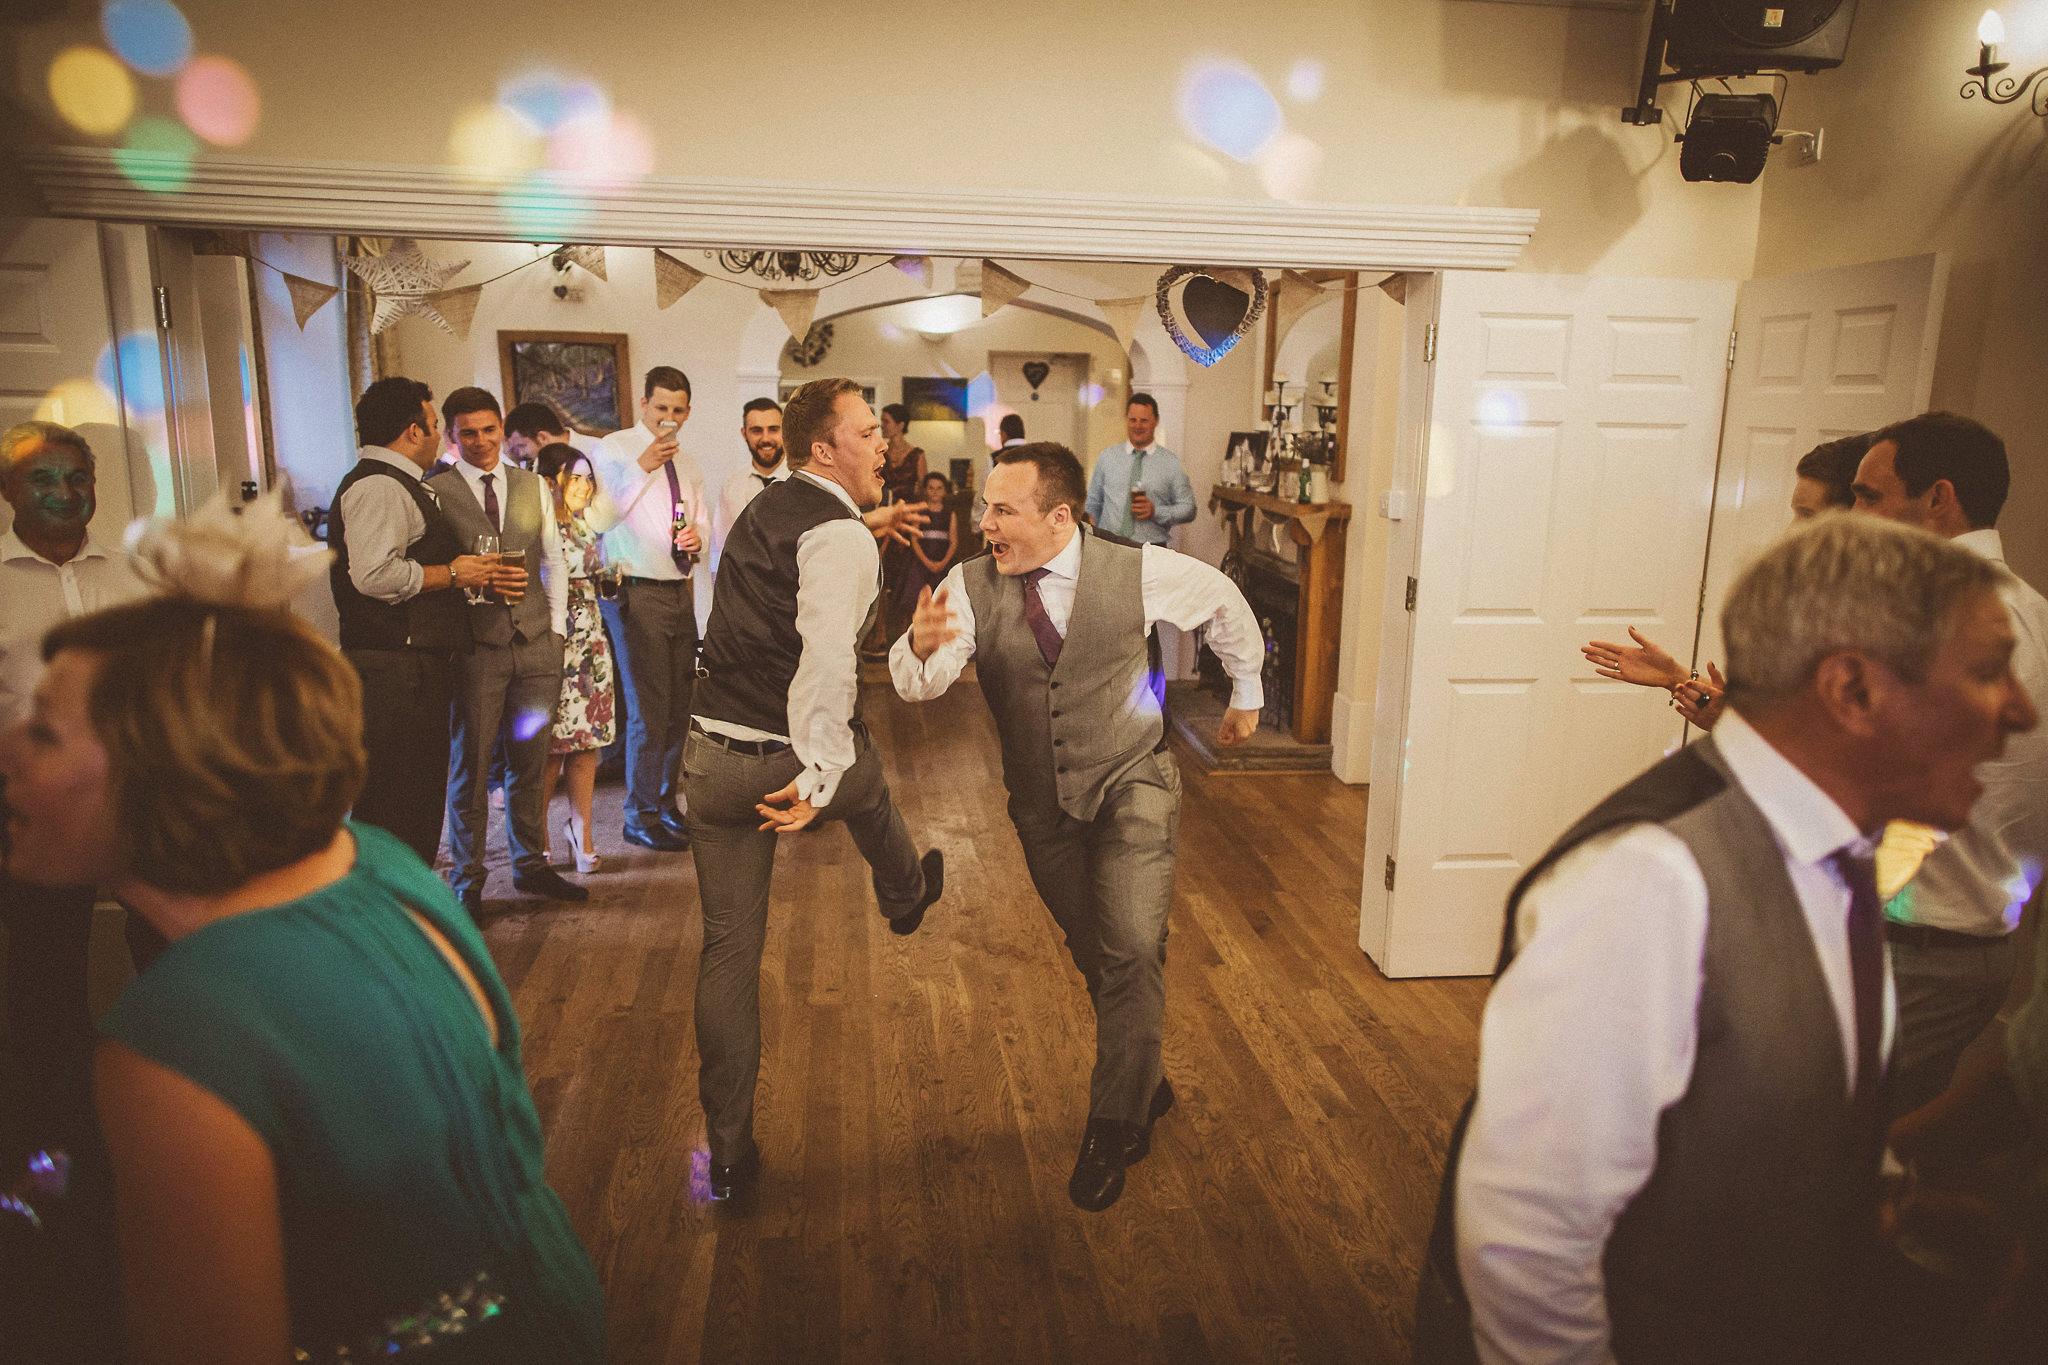 paul-marbrook-Caer-Llan-Wedding-Photographer-90097